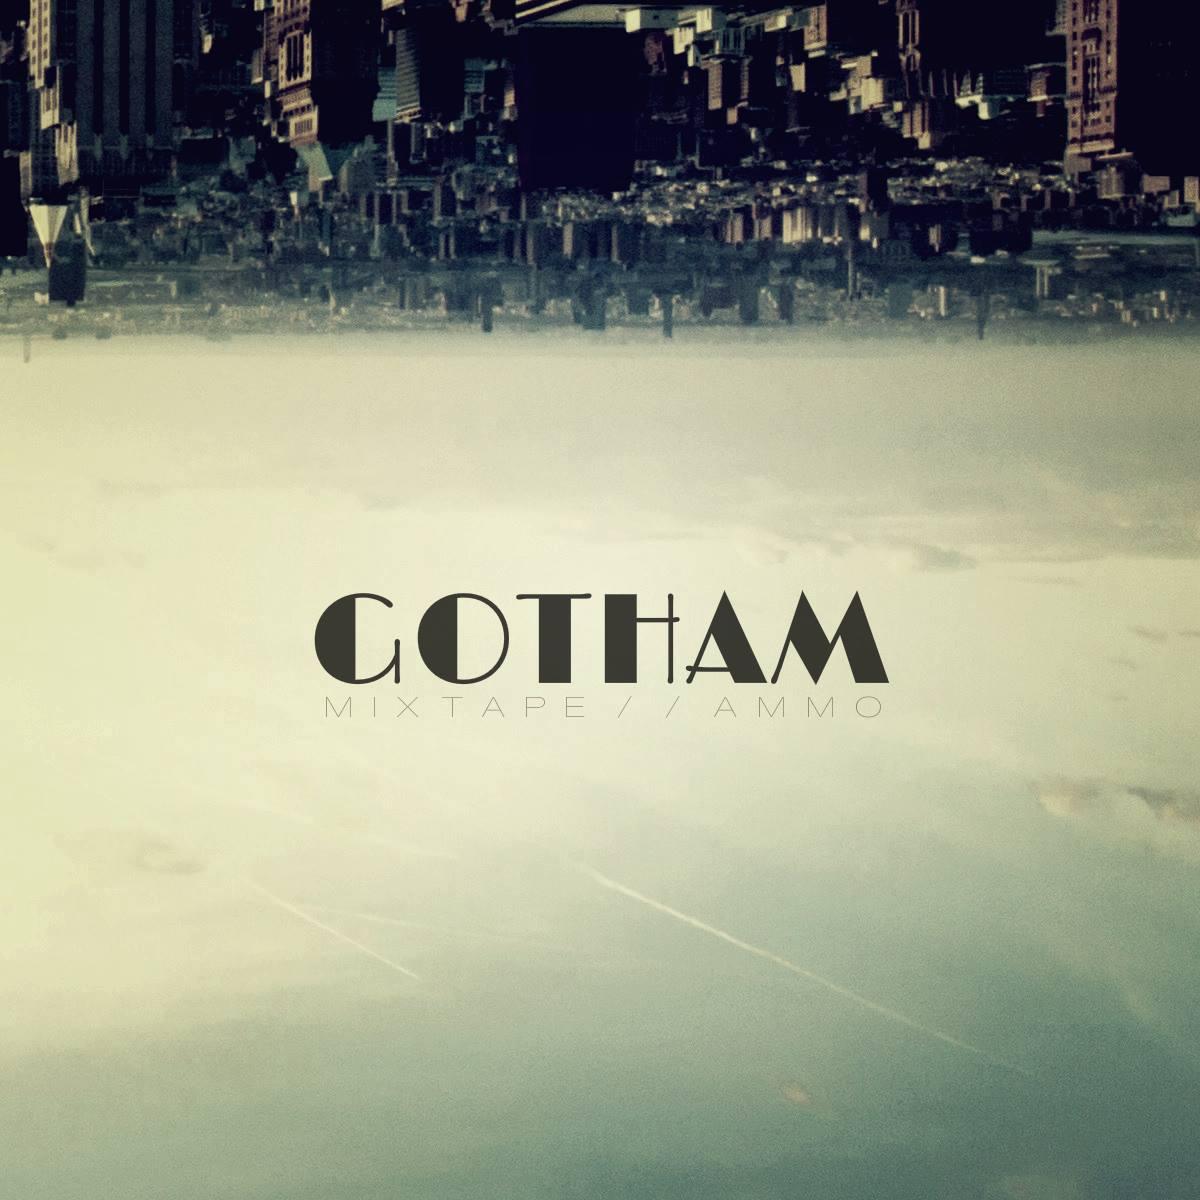 gotham-frontcover